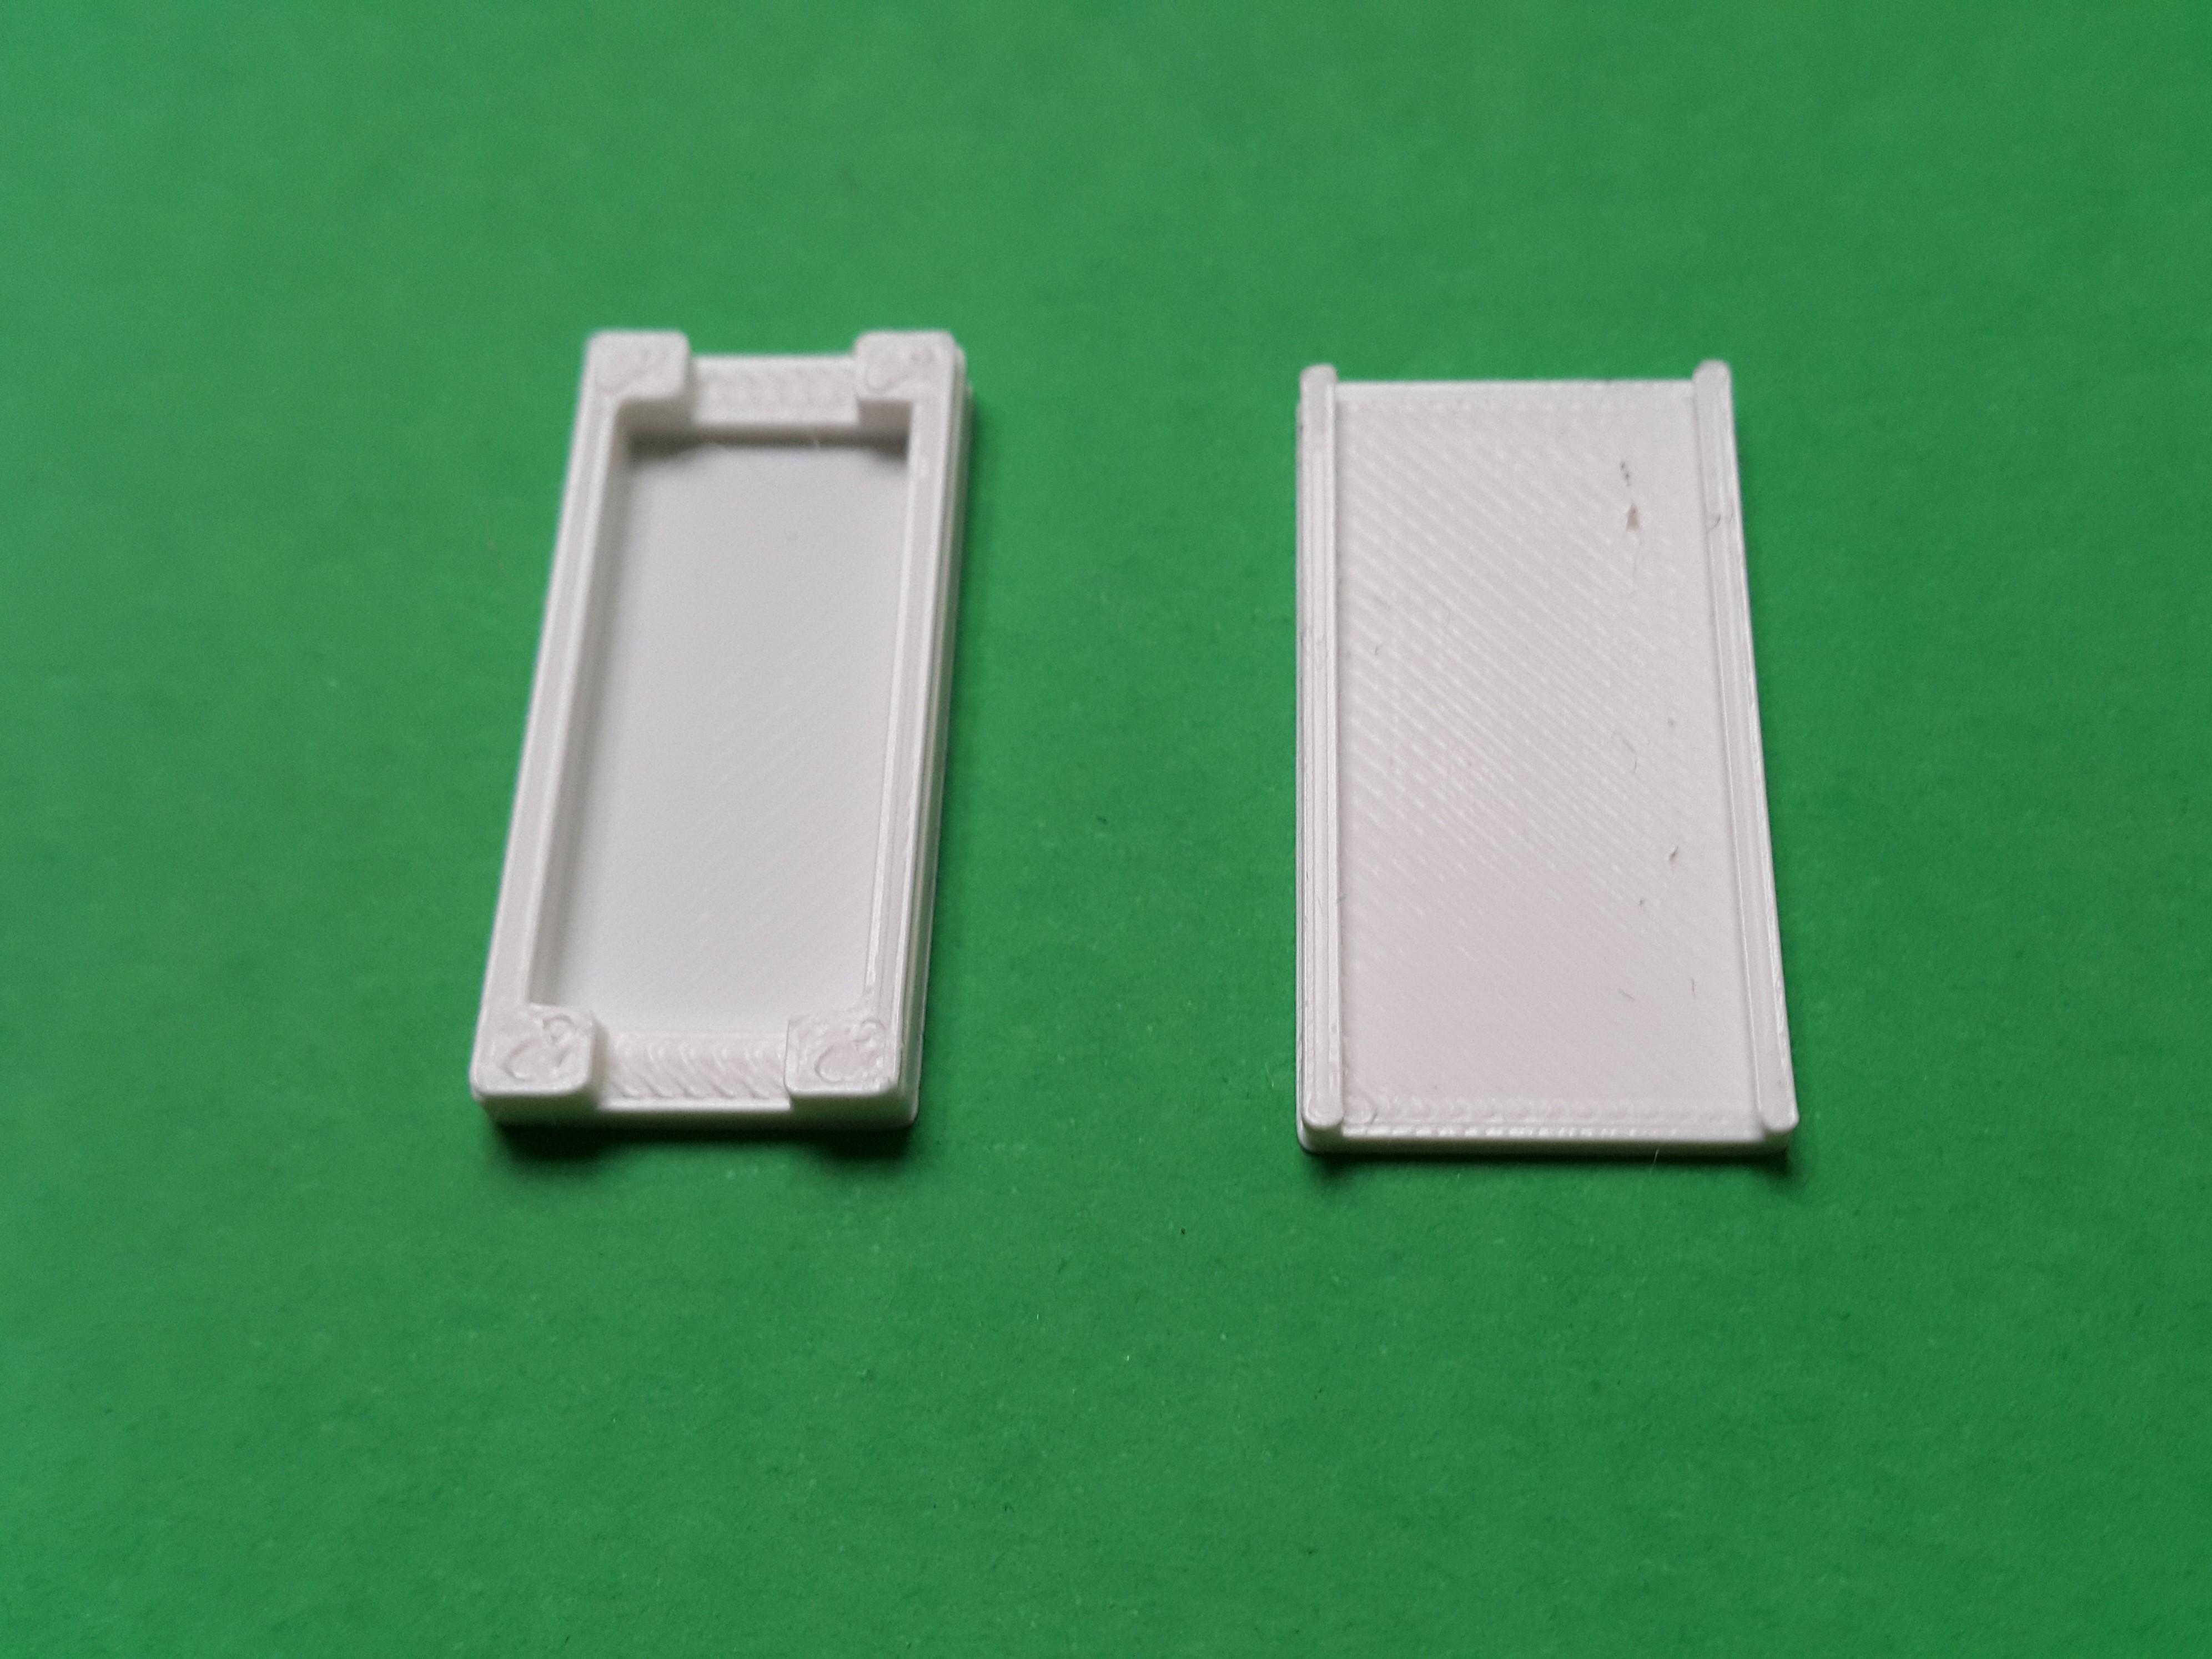 3.jpg Download free STL file WS2812 led shade • 3D print design, DK7